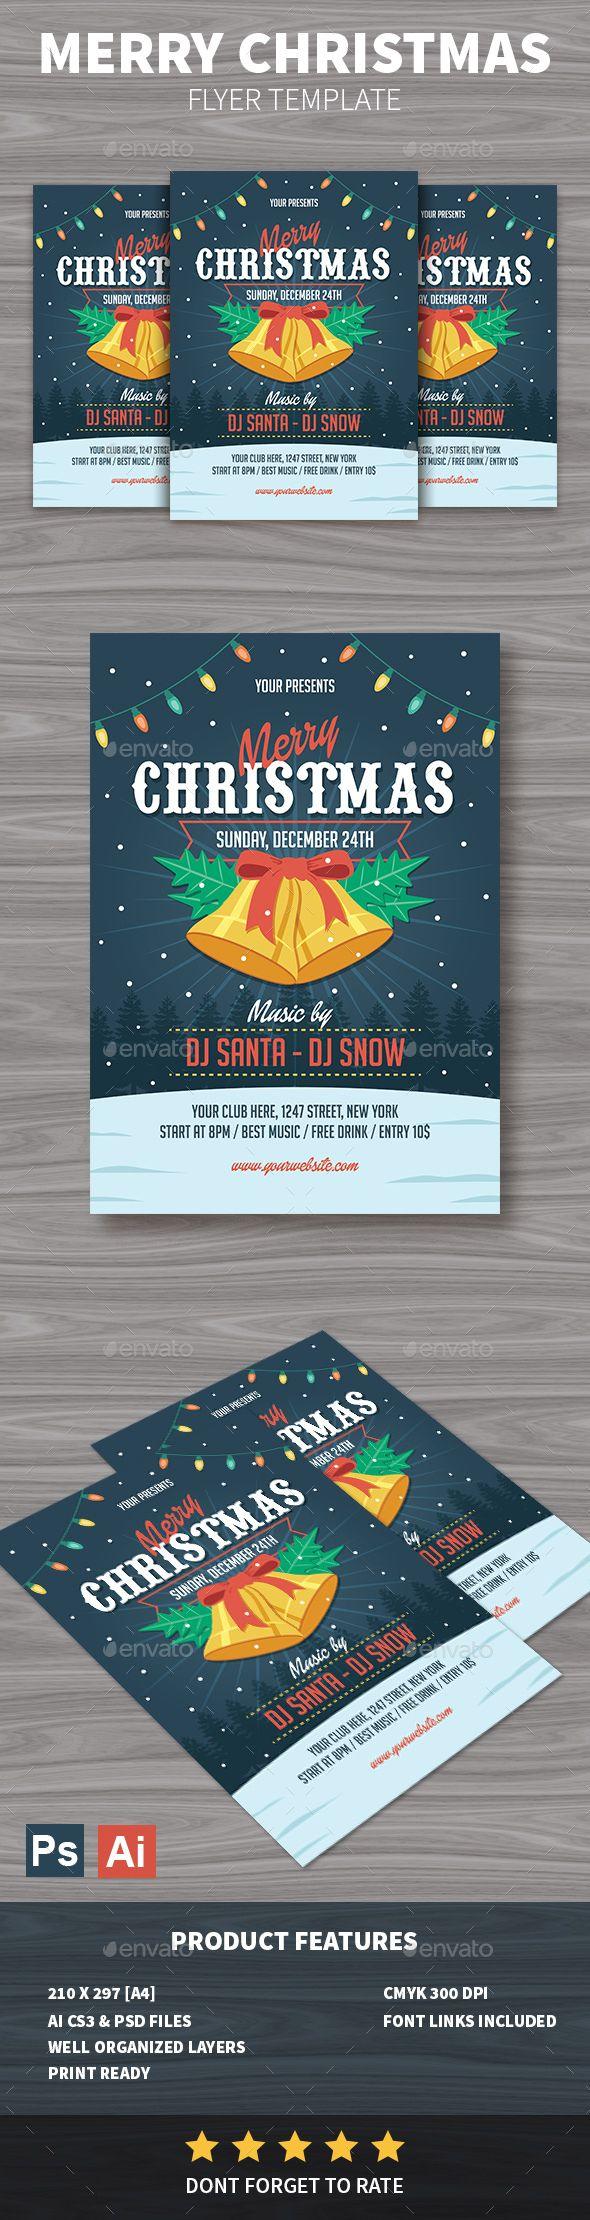 Merry Christmas Flyer Template PSD, AI Illustrator #xmas